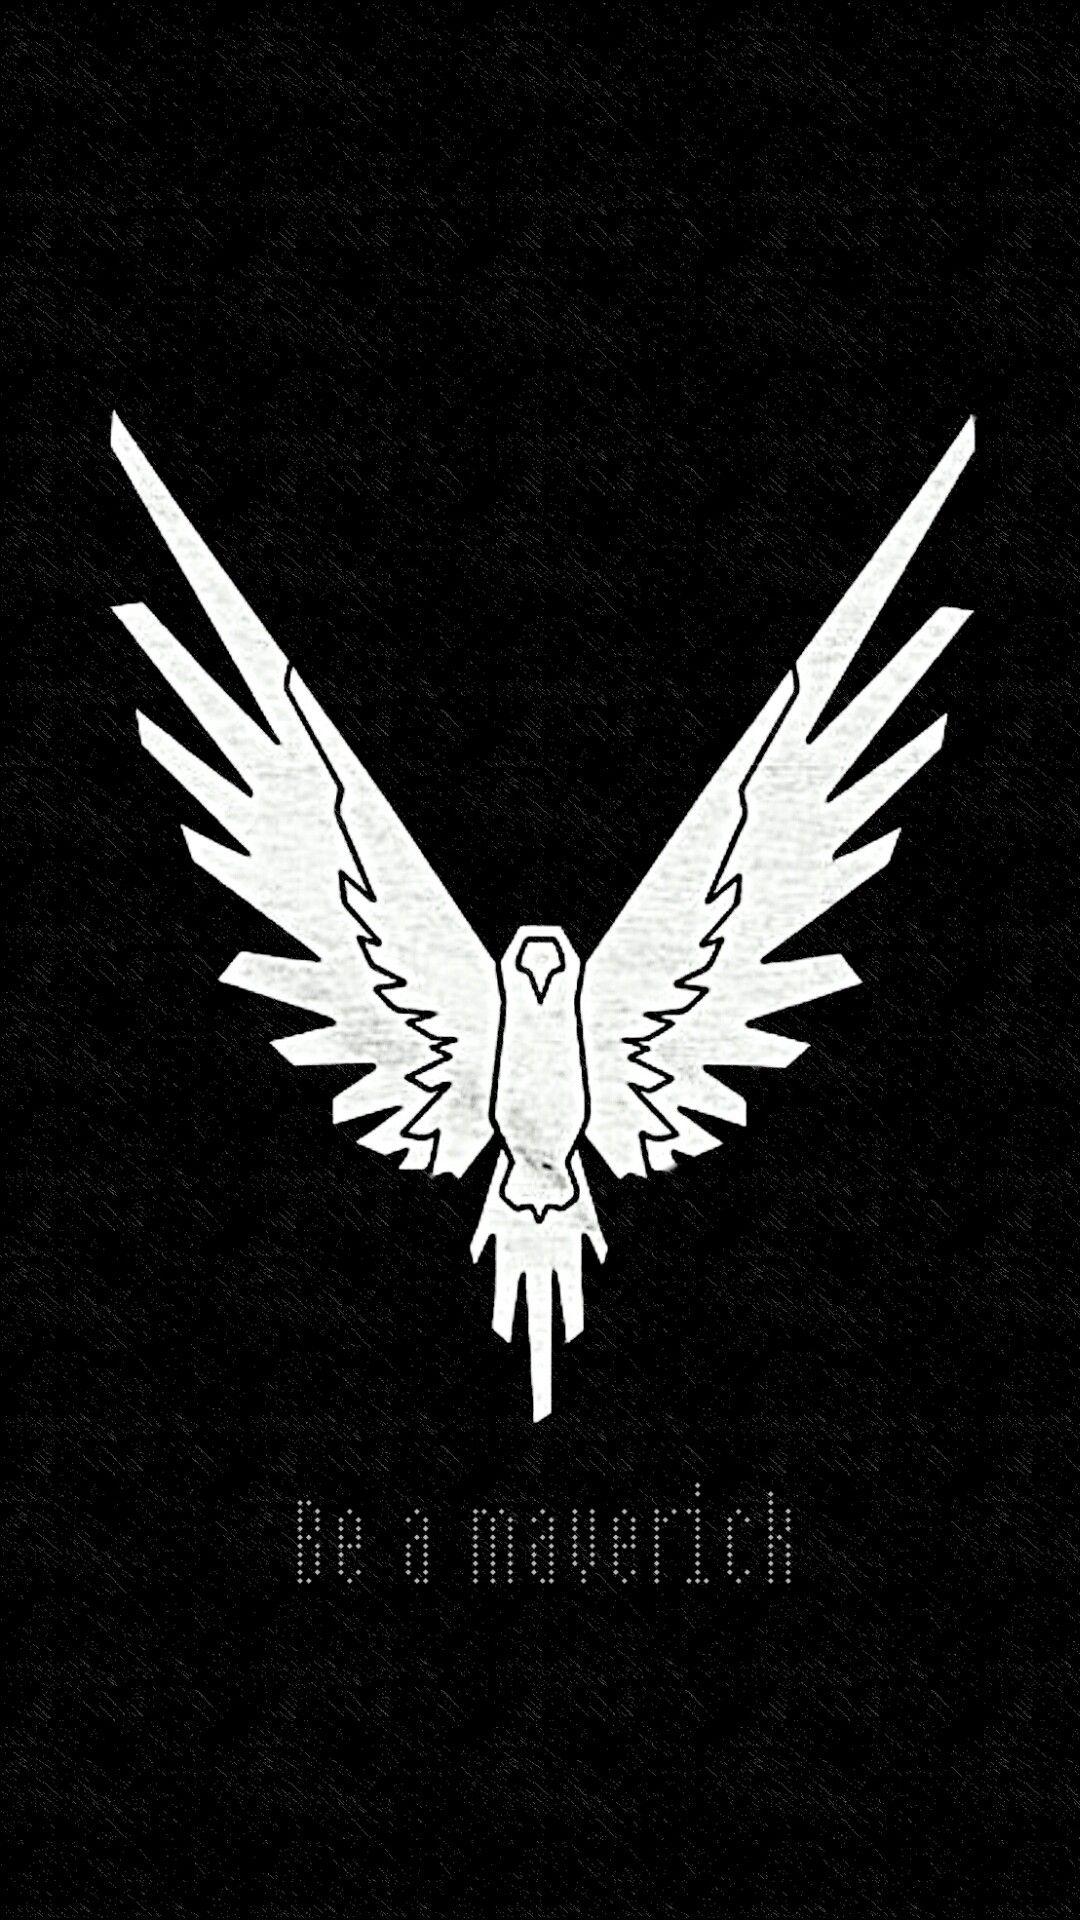 Logan Paul Maverick Logo Be A Maverick Be A Maverick